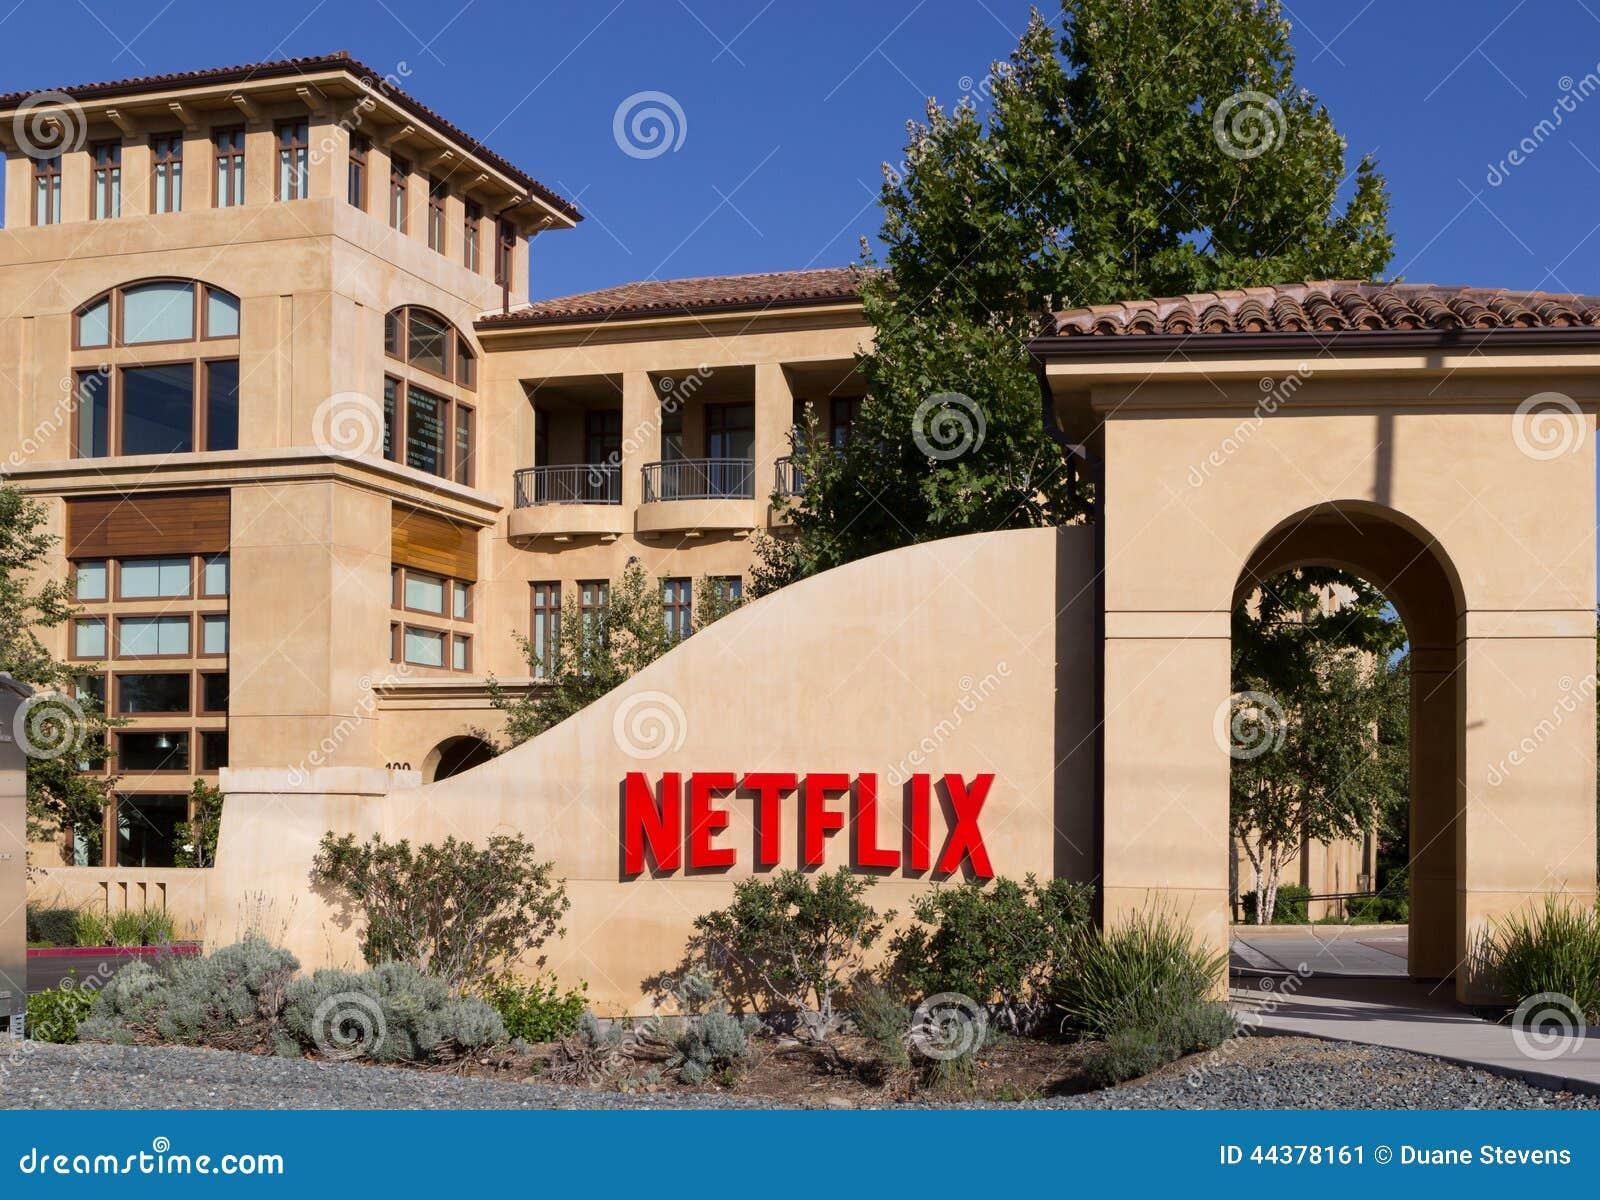 Netflix headquarters, Los Gatos, California USA